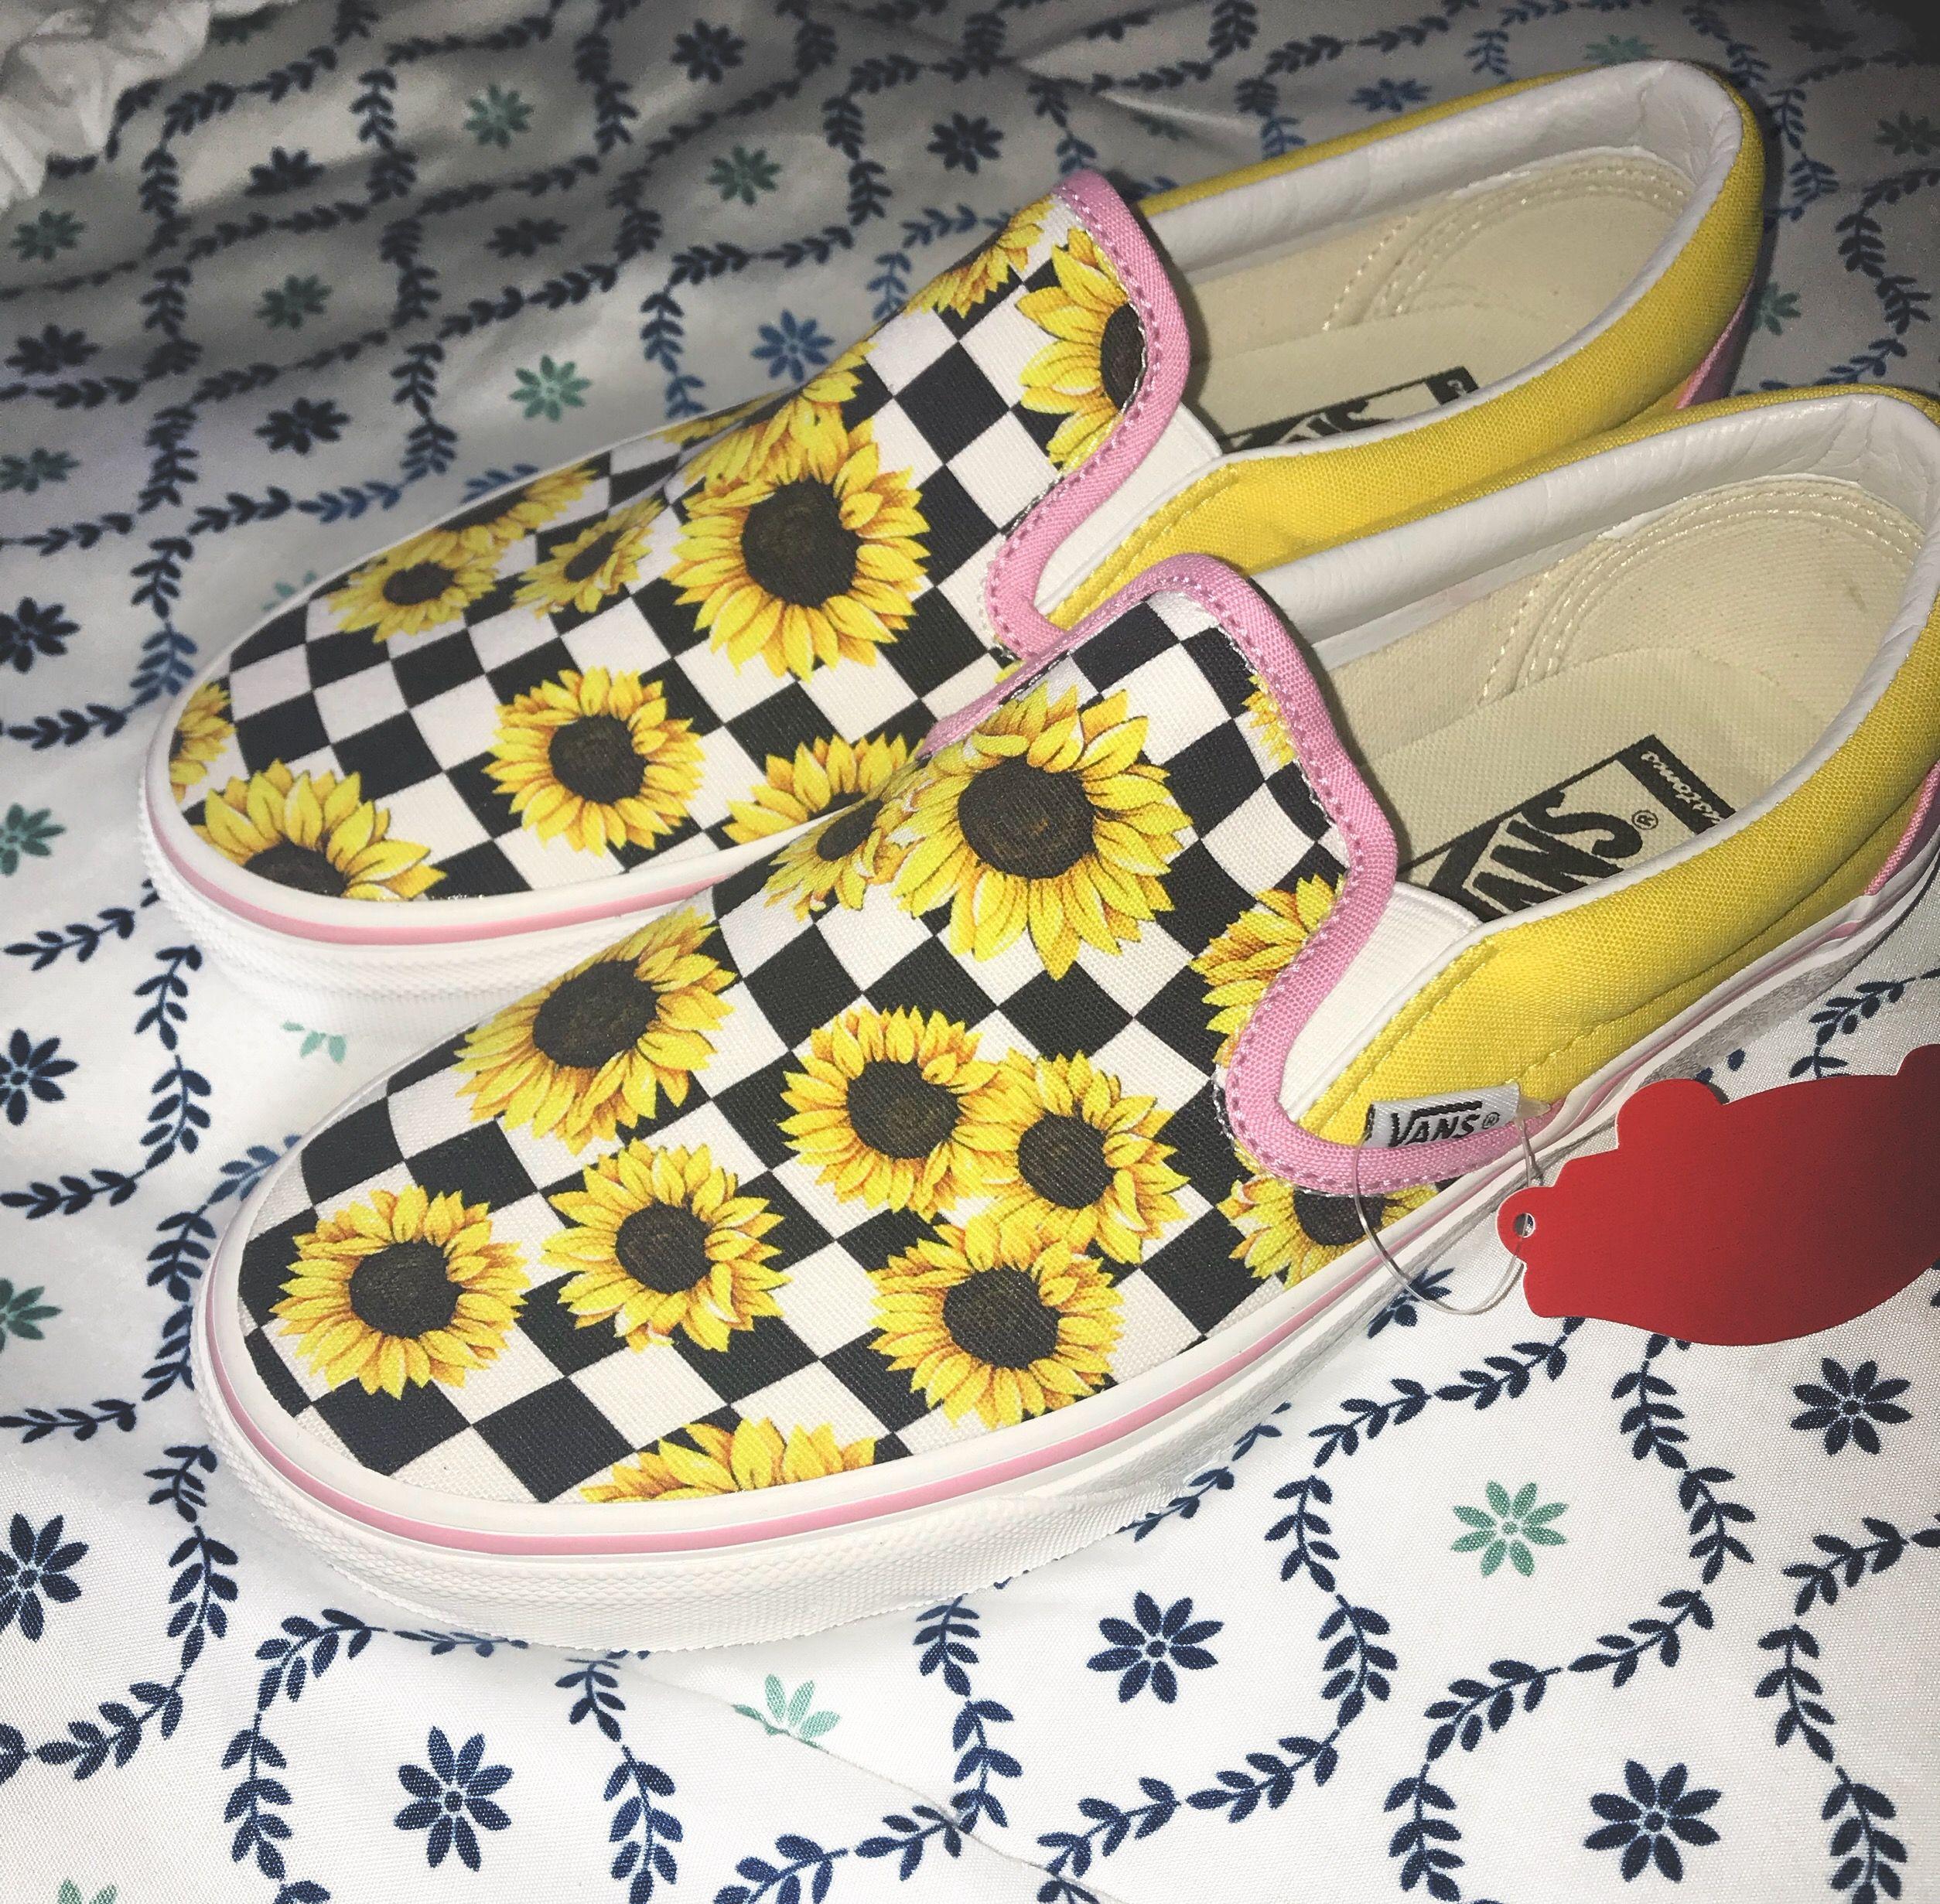 Sunflower vans | Sunflower vans shoes